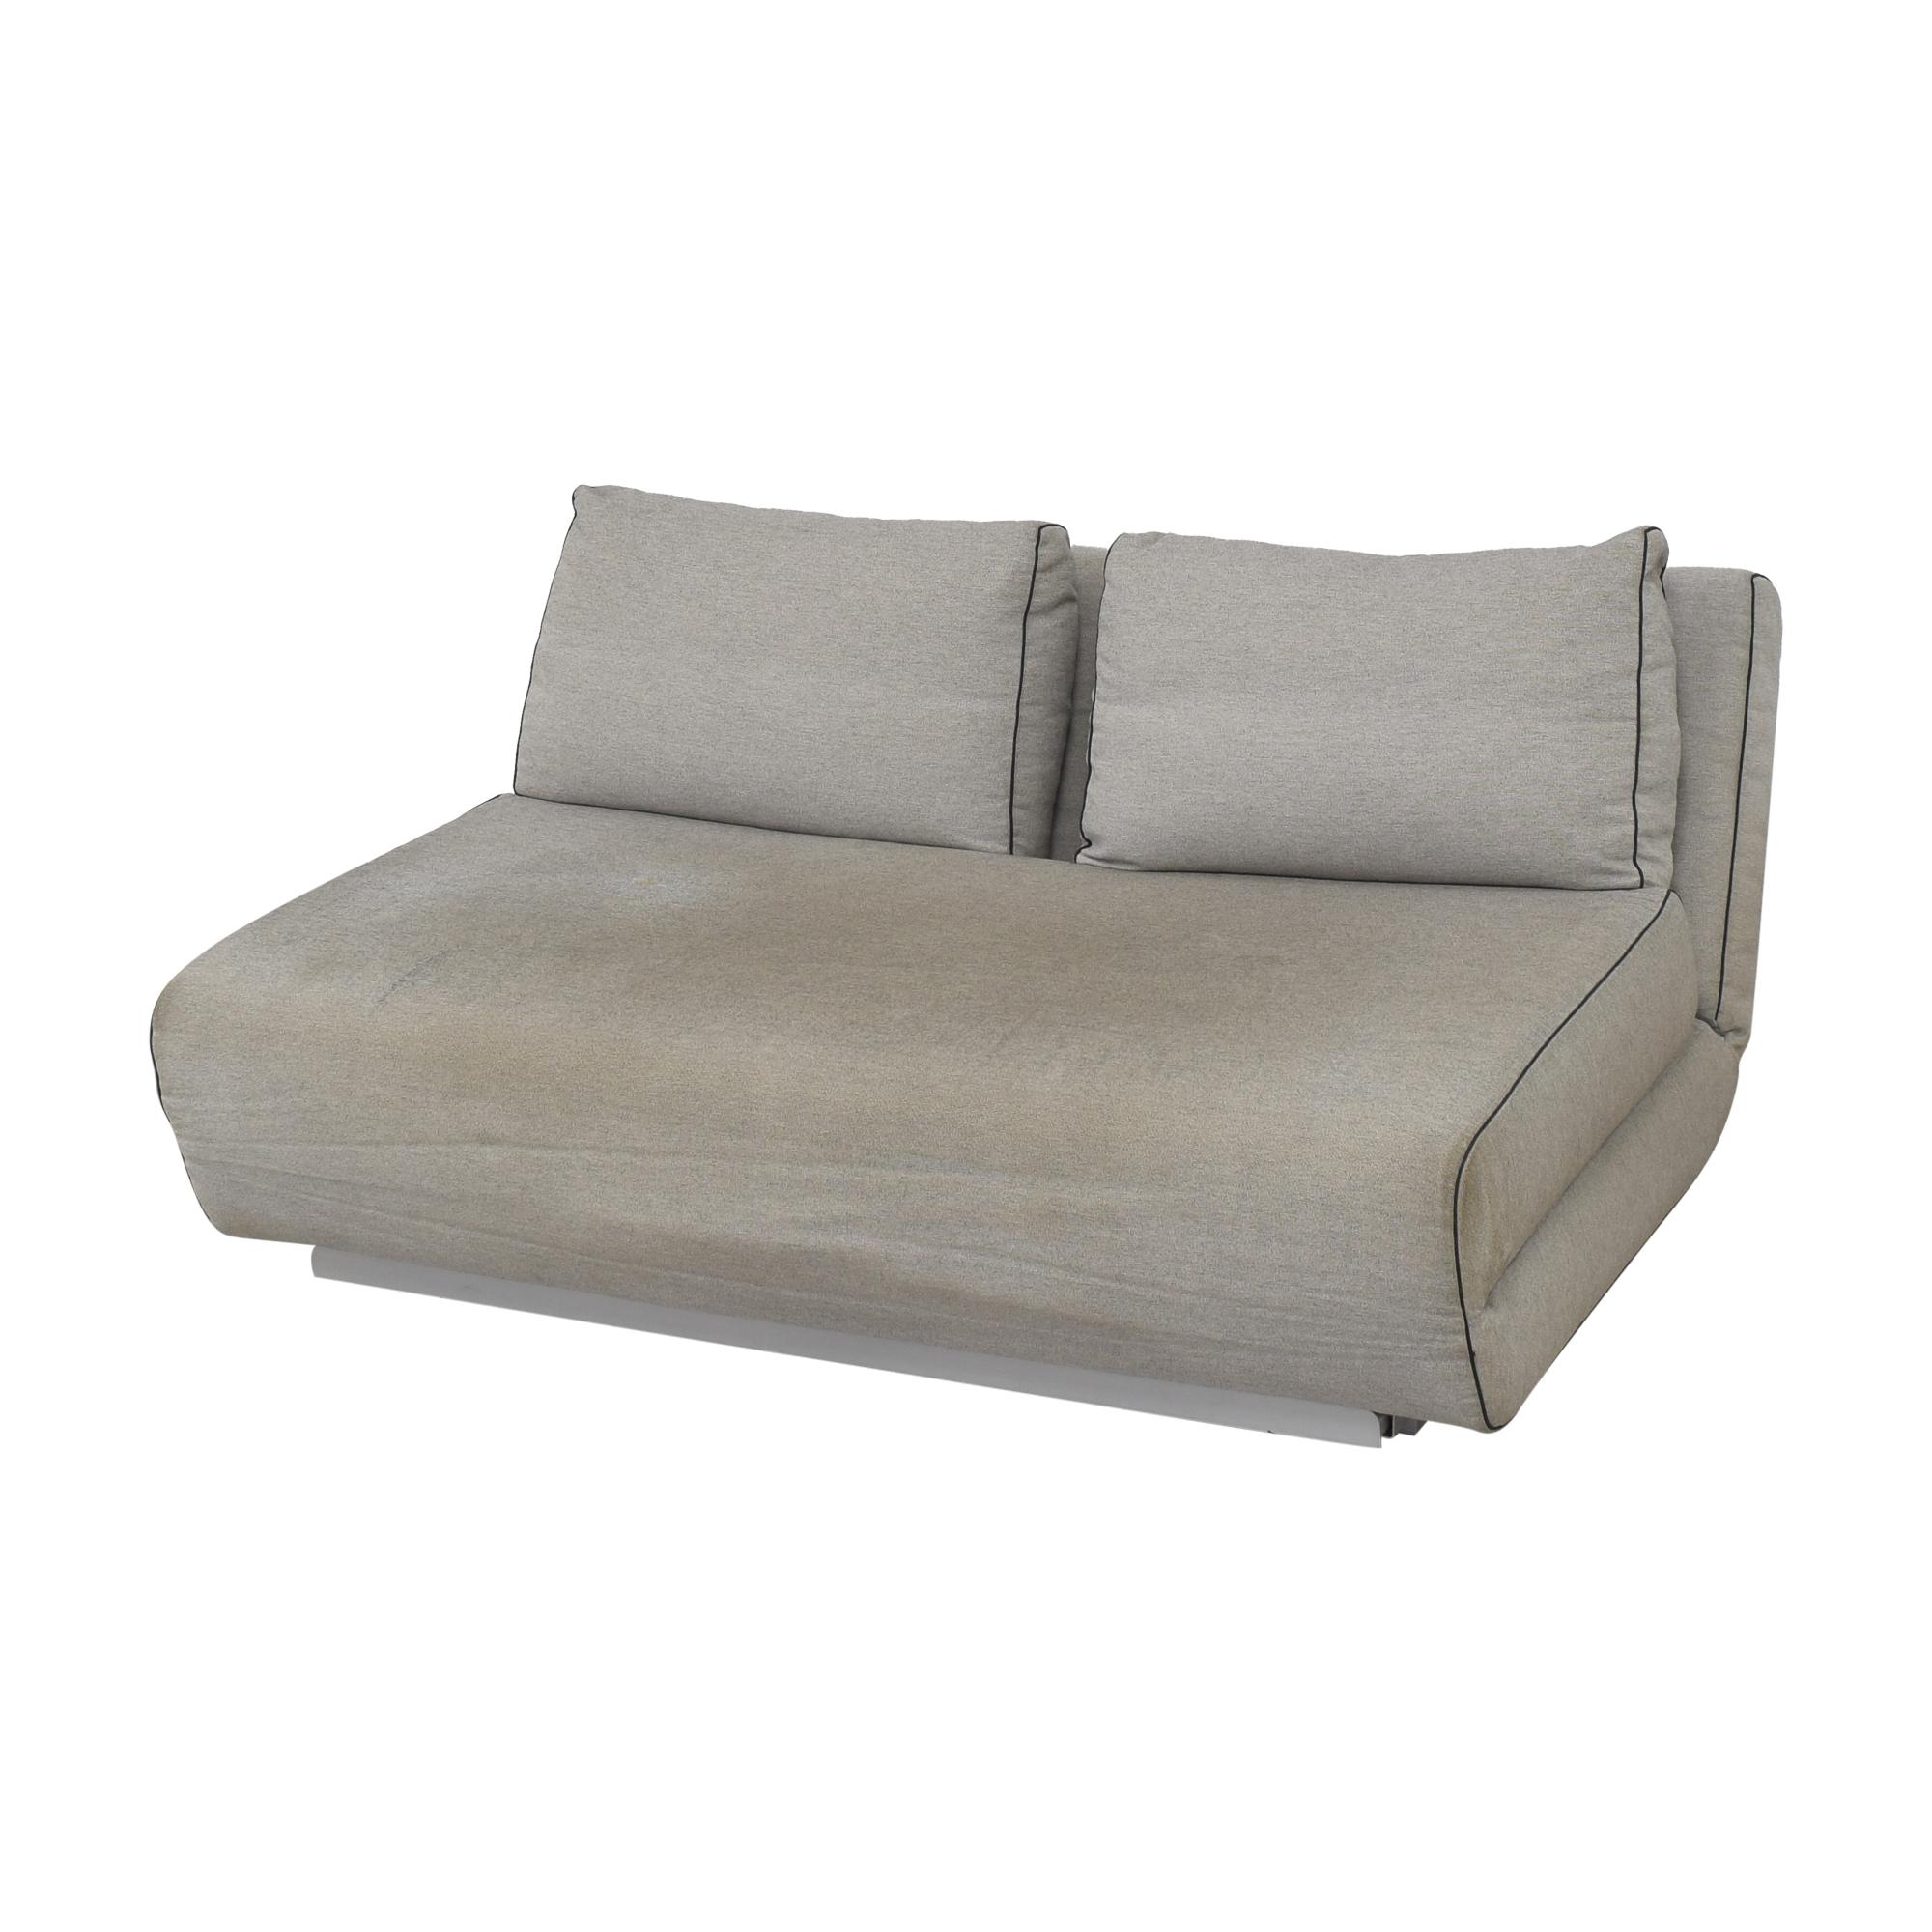 Softline Softline City 2.5 Seater Sofa Bed used